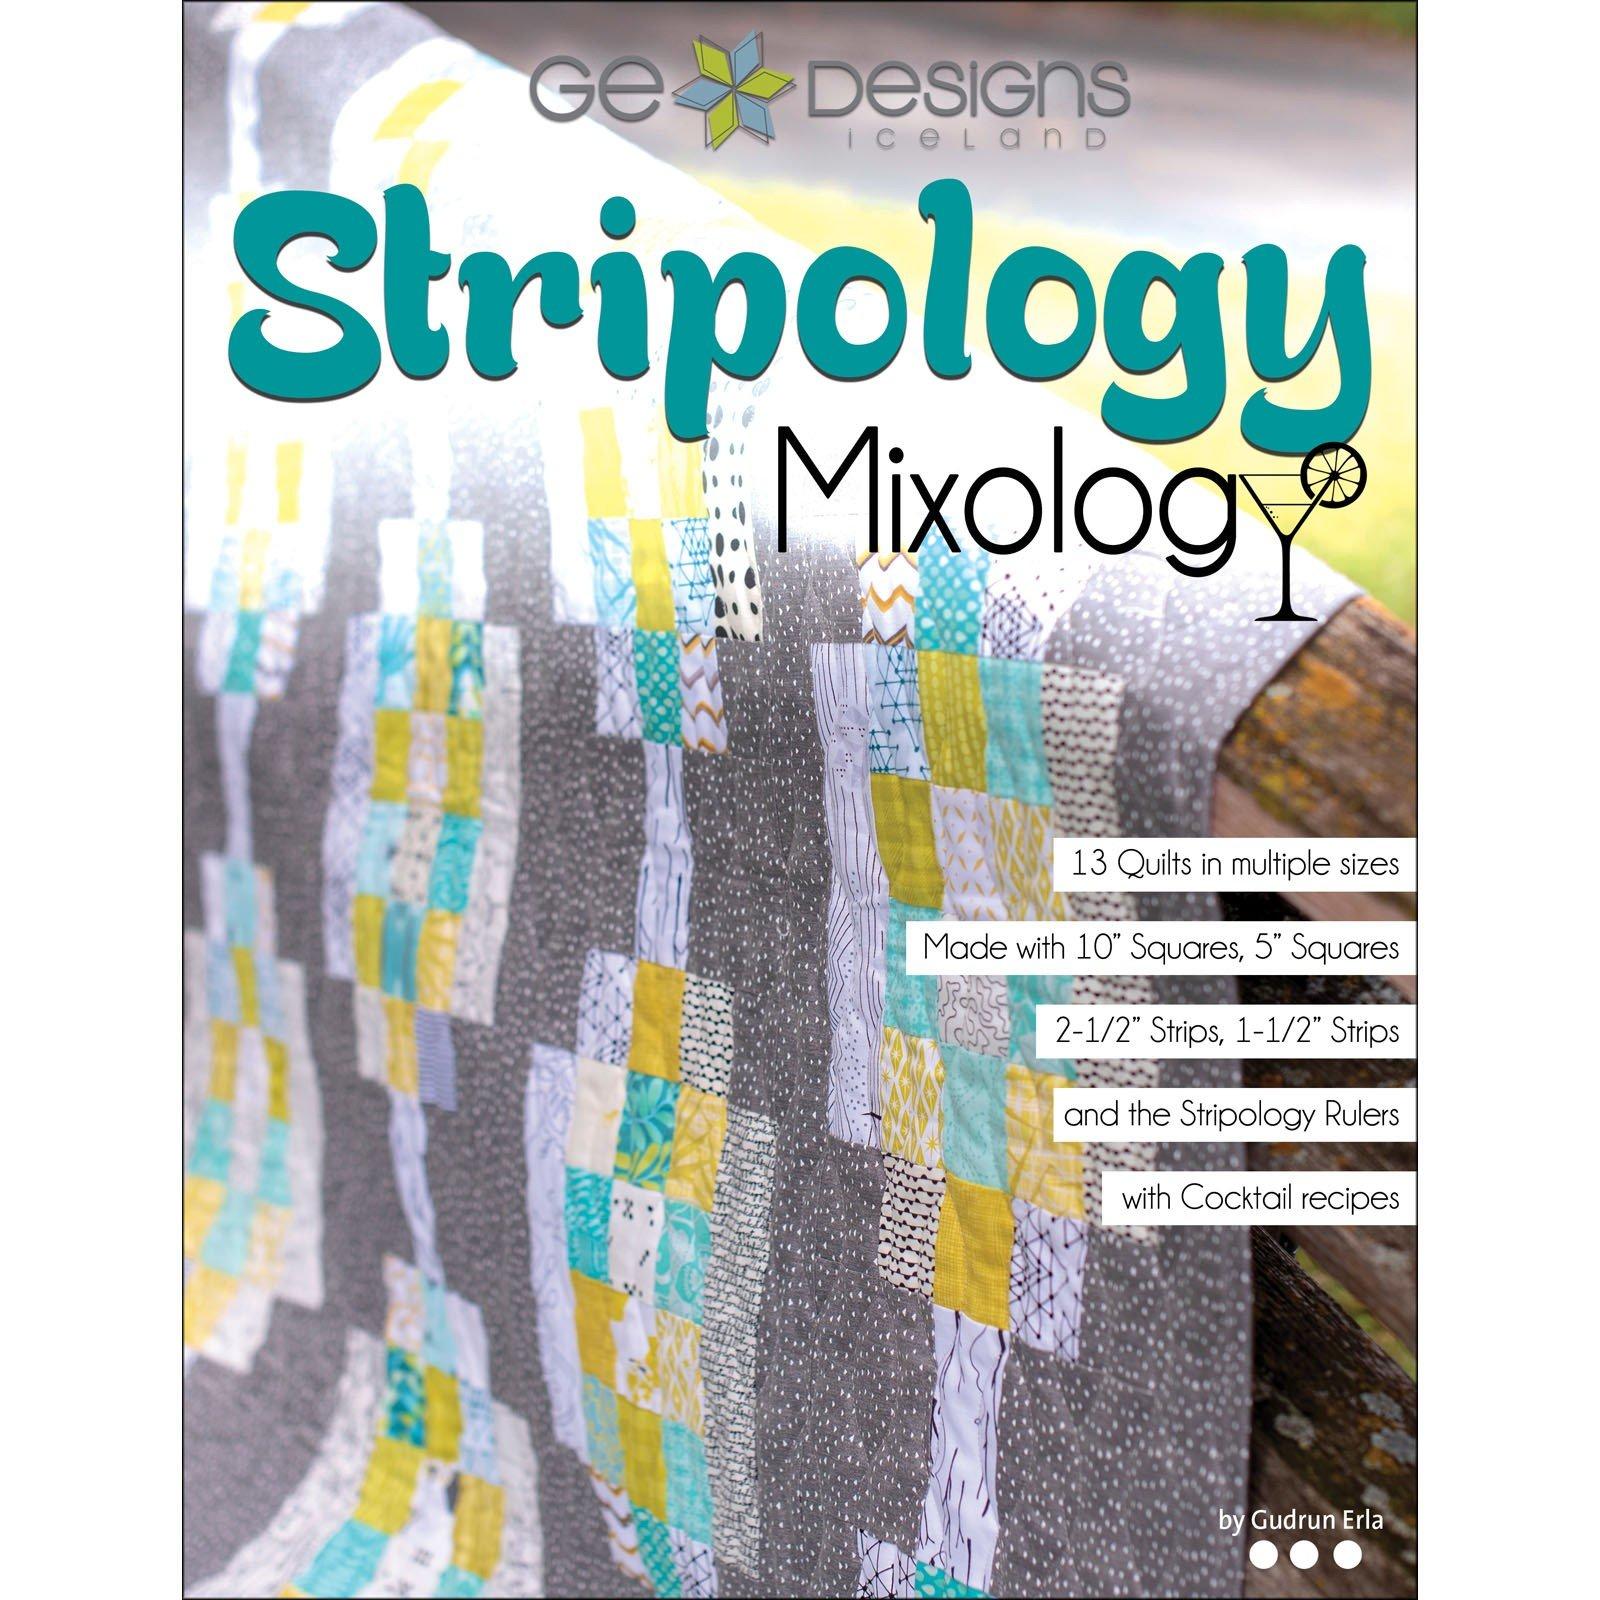 Stripology Mixology<br/>GE Designs